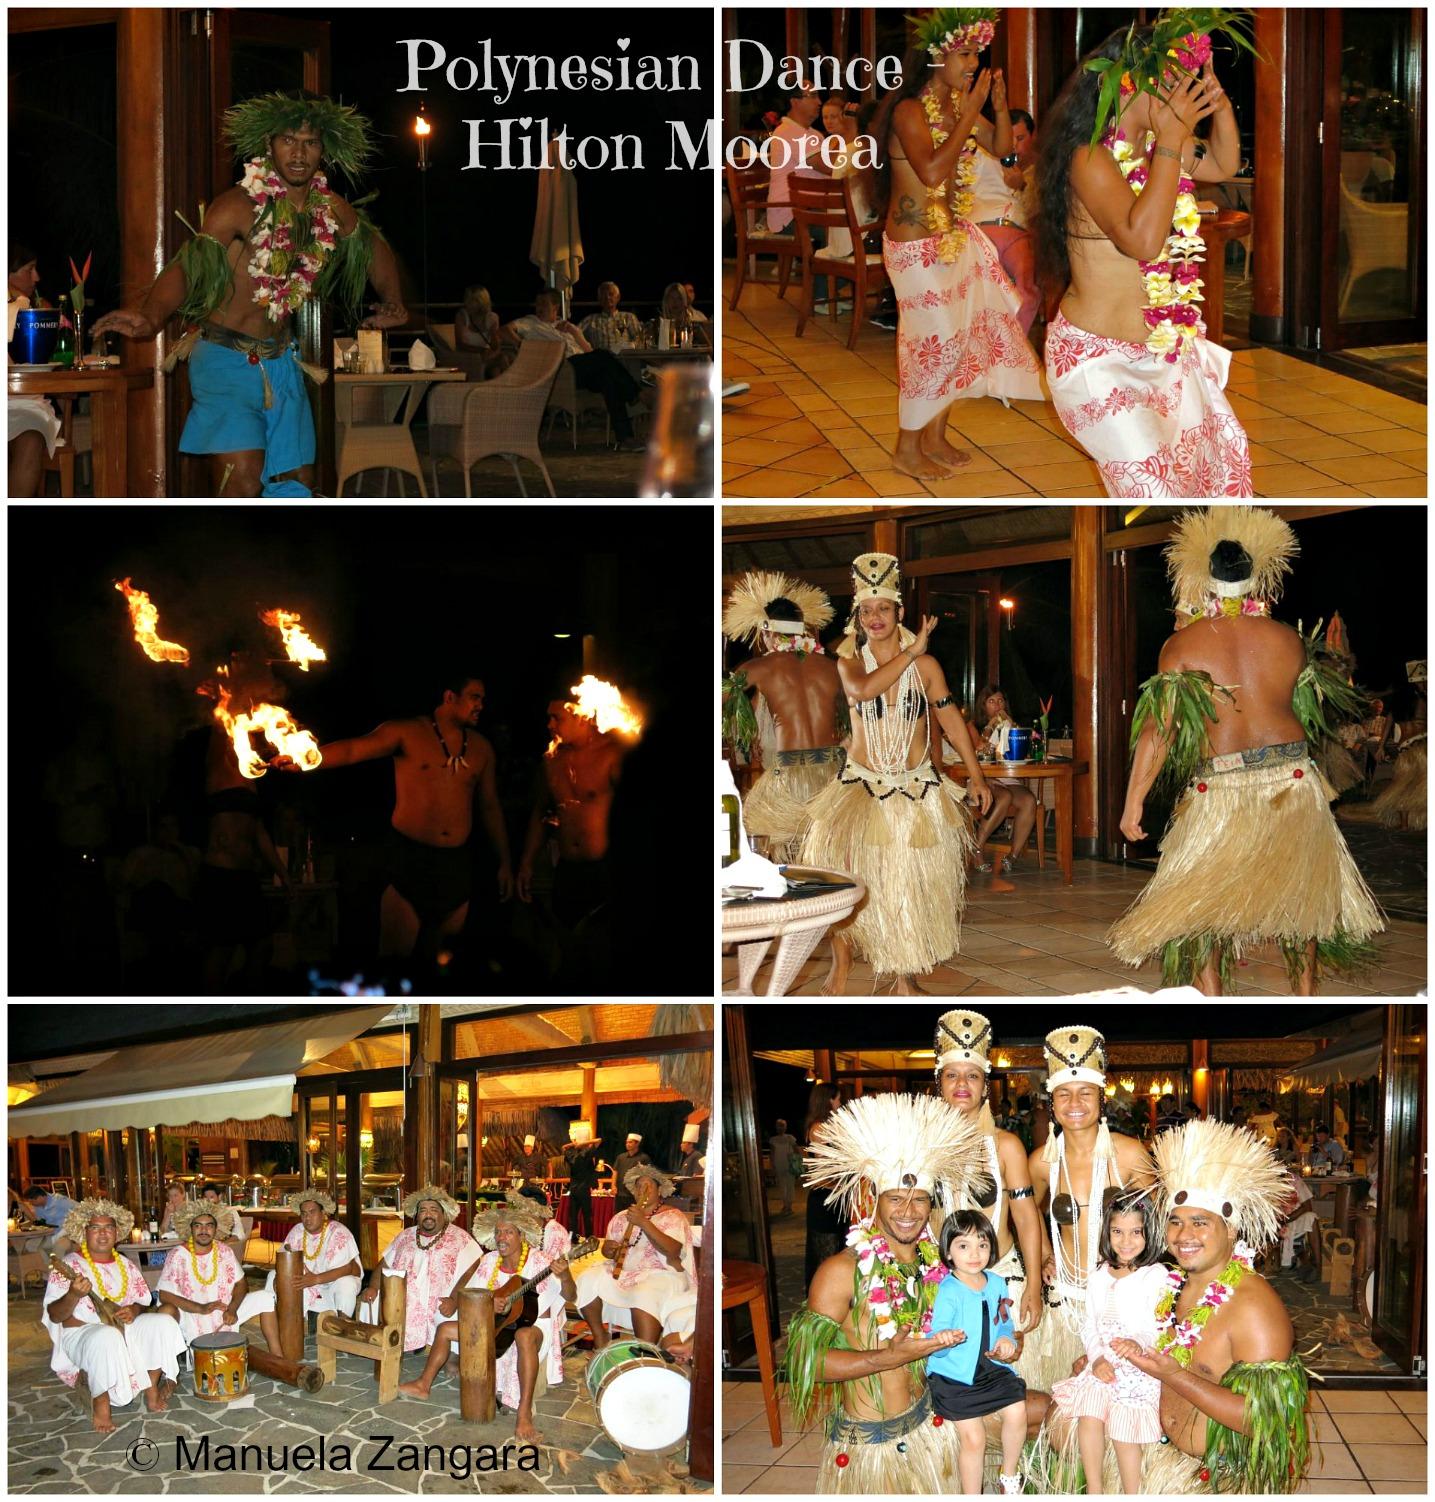 Polynesian Dance 1